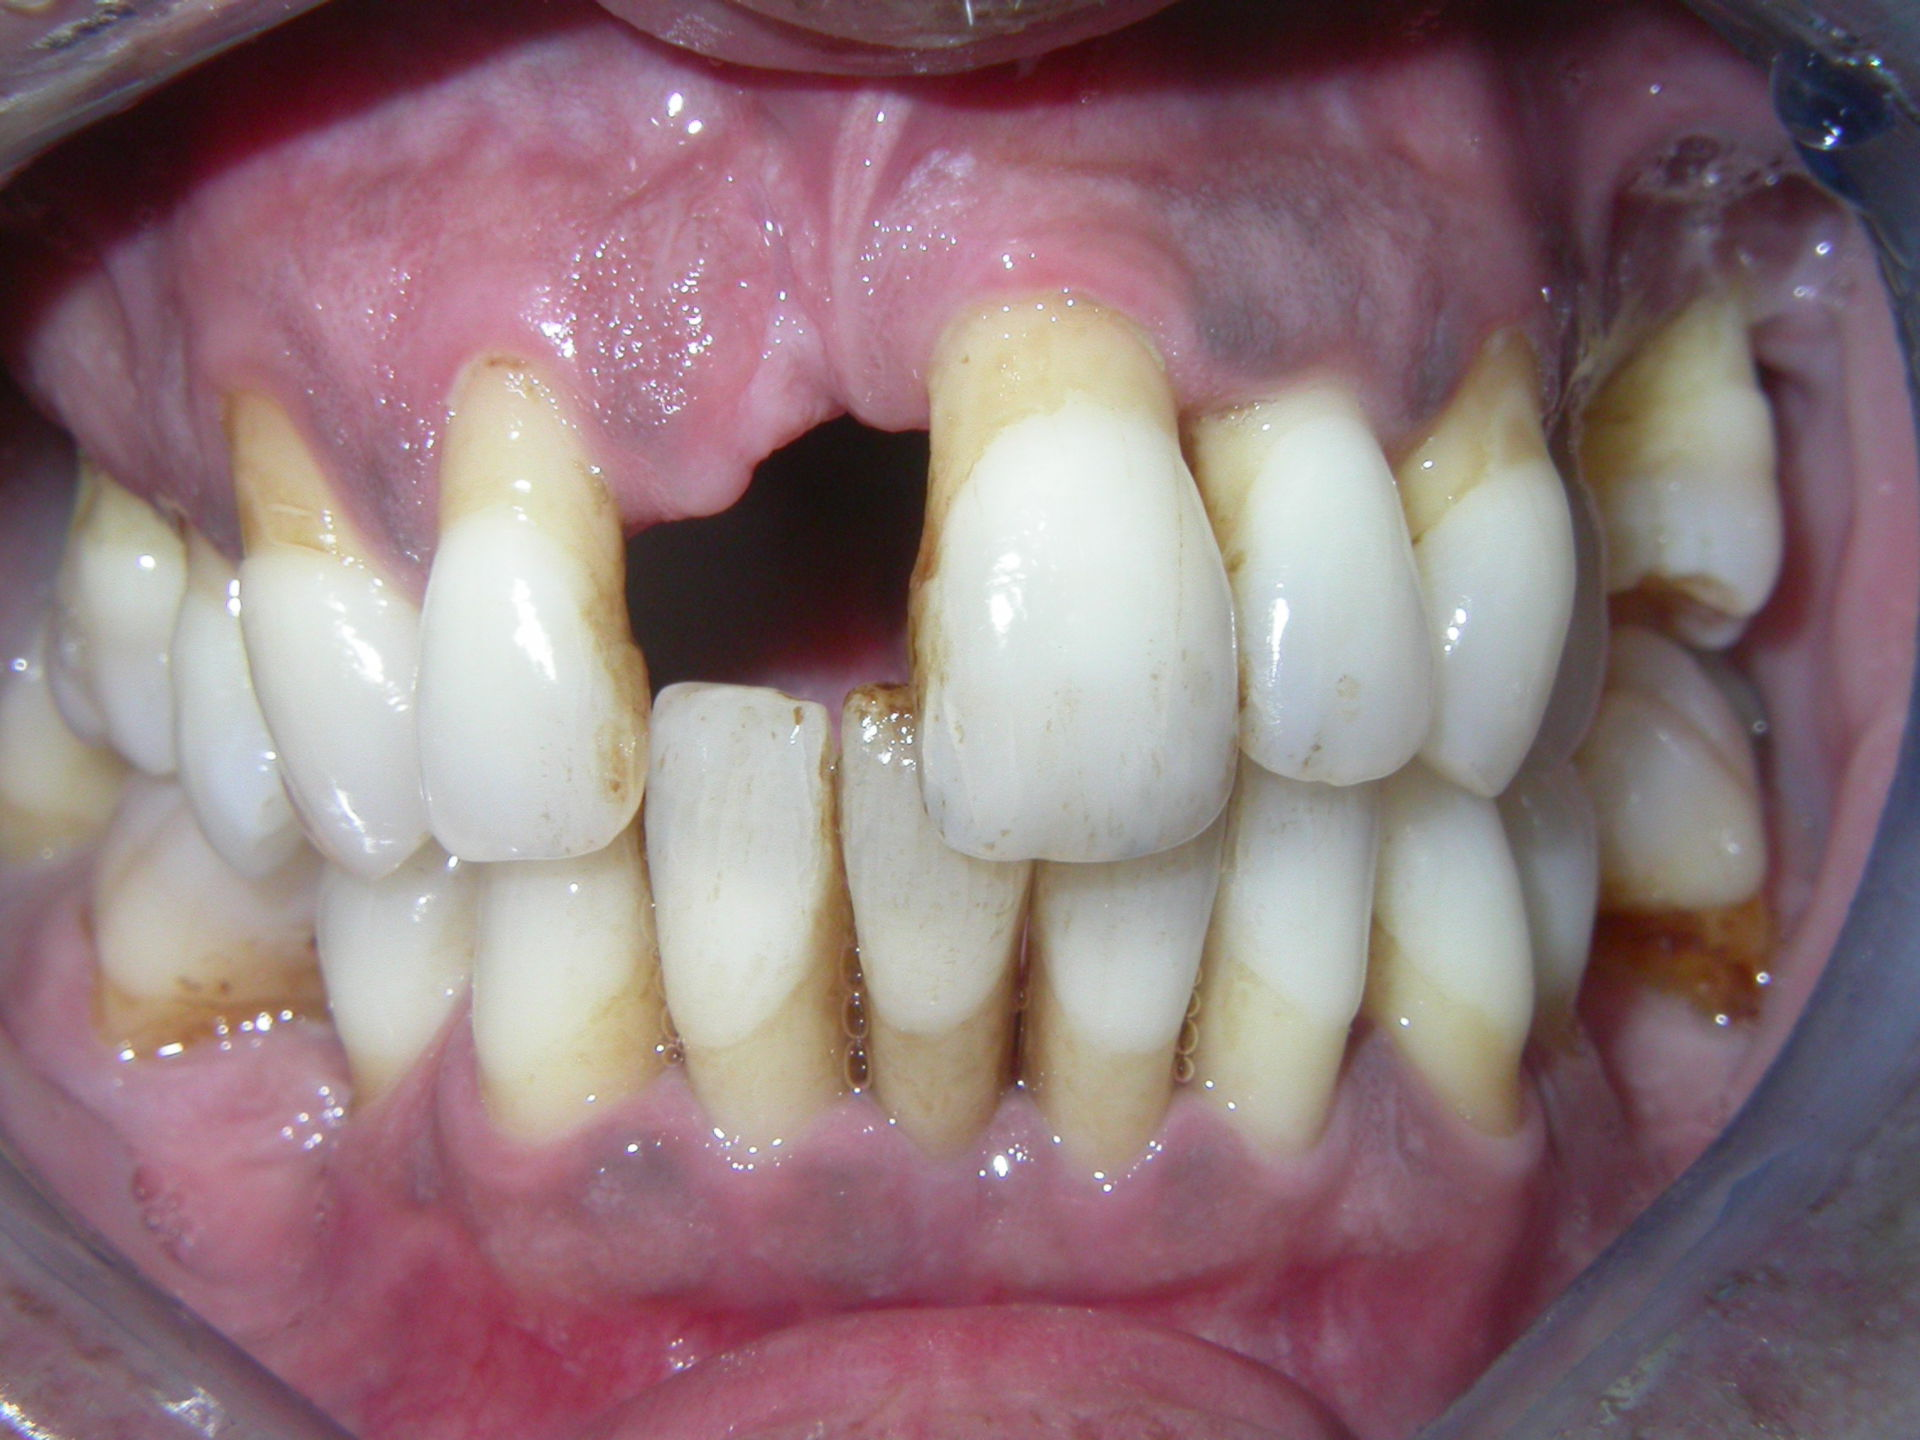 Central incisor lost